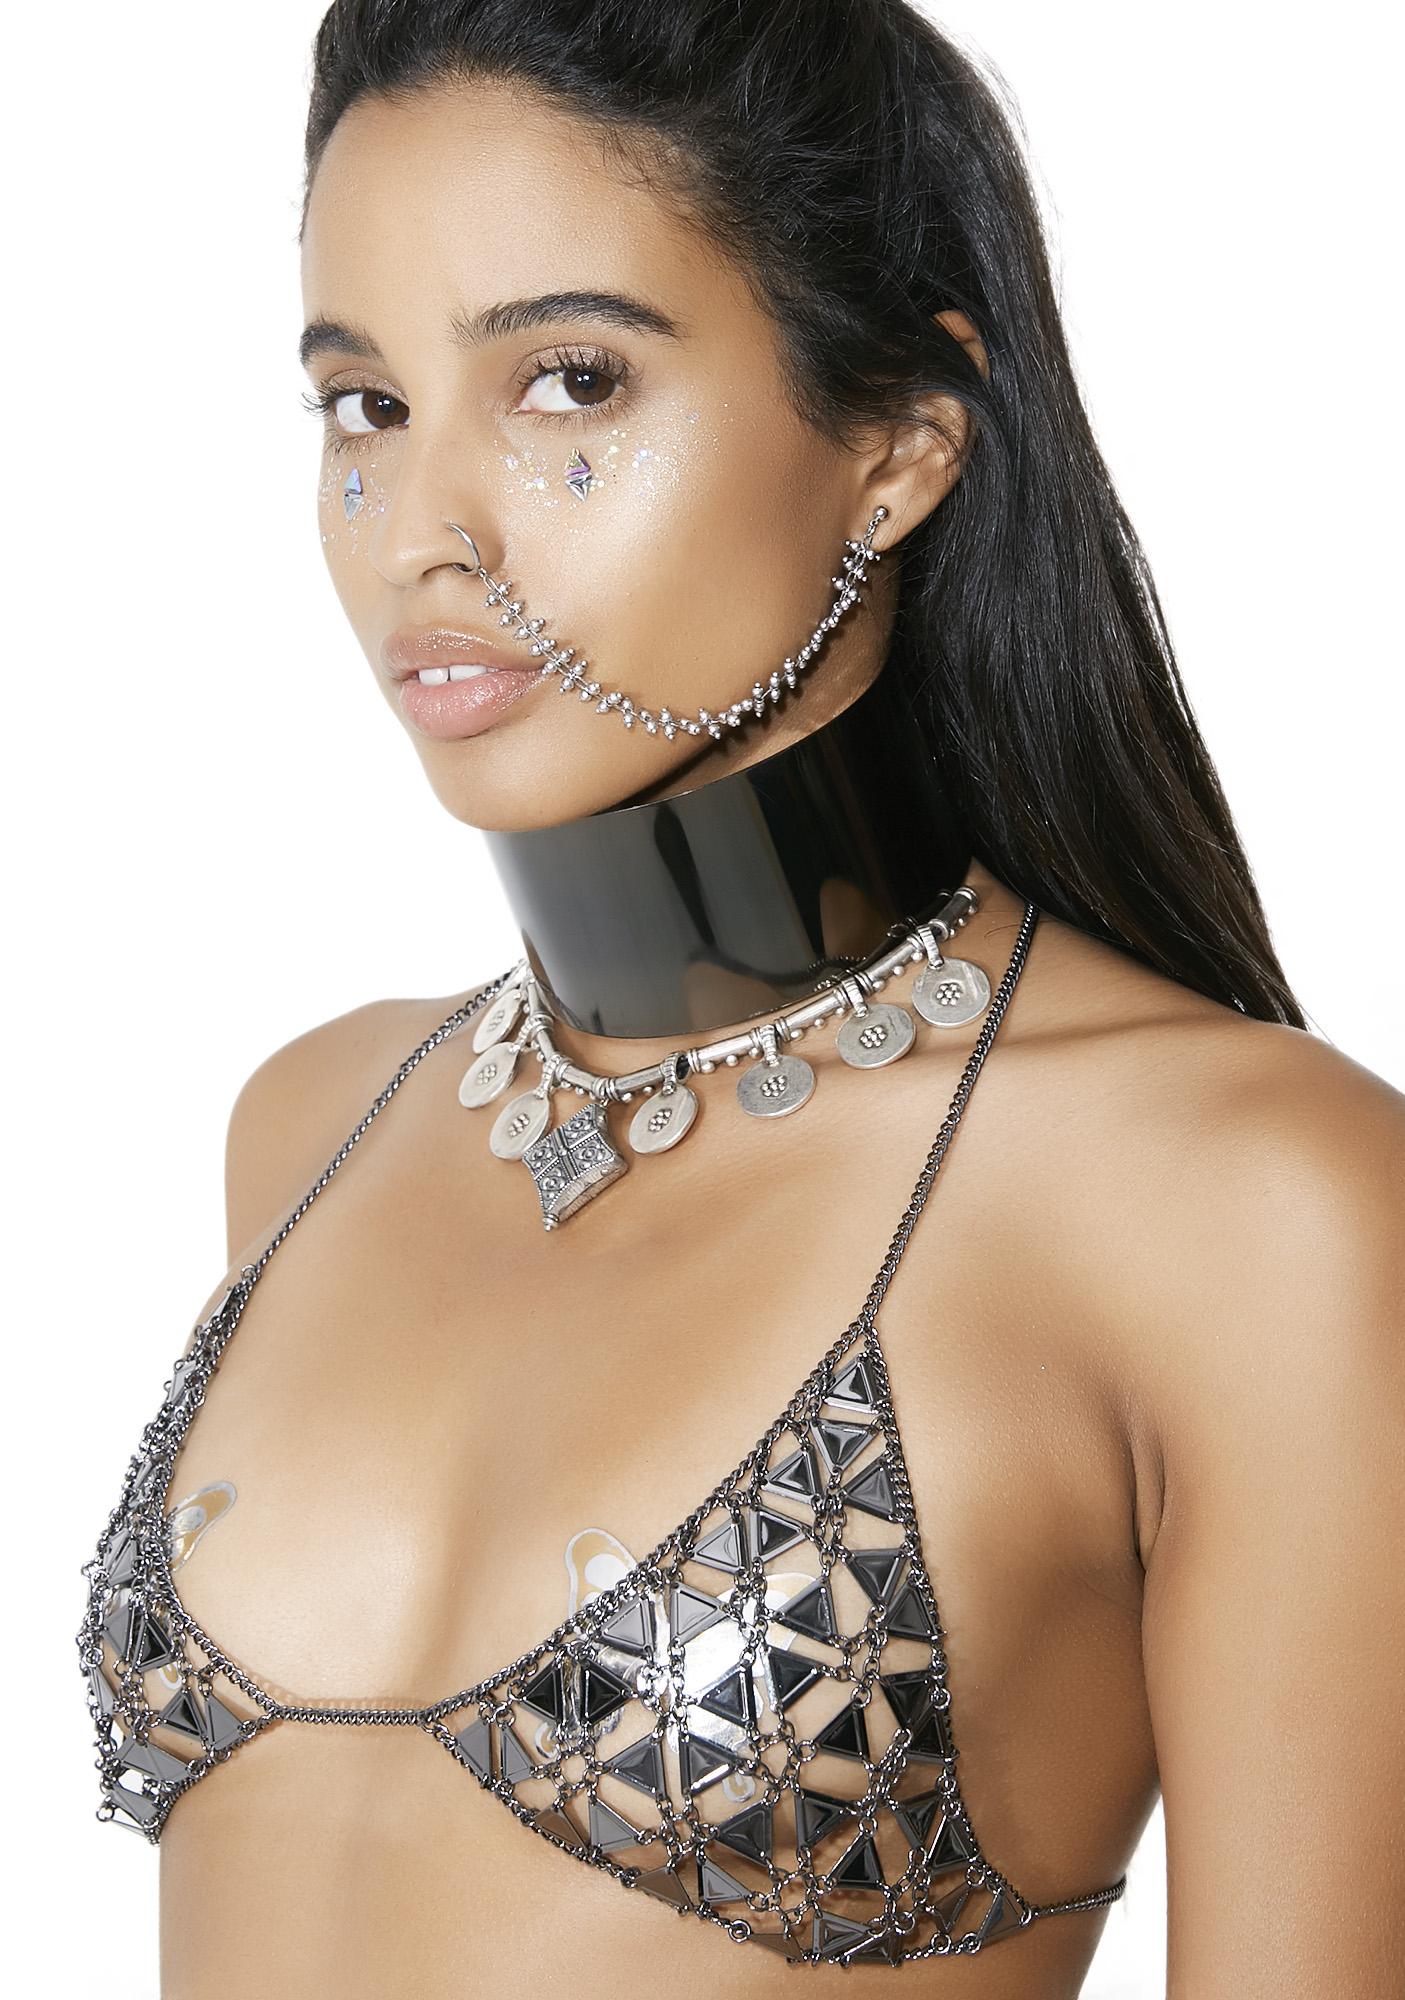 Gunmetal Princess Organa Chain Bra